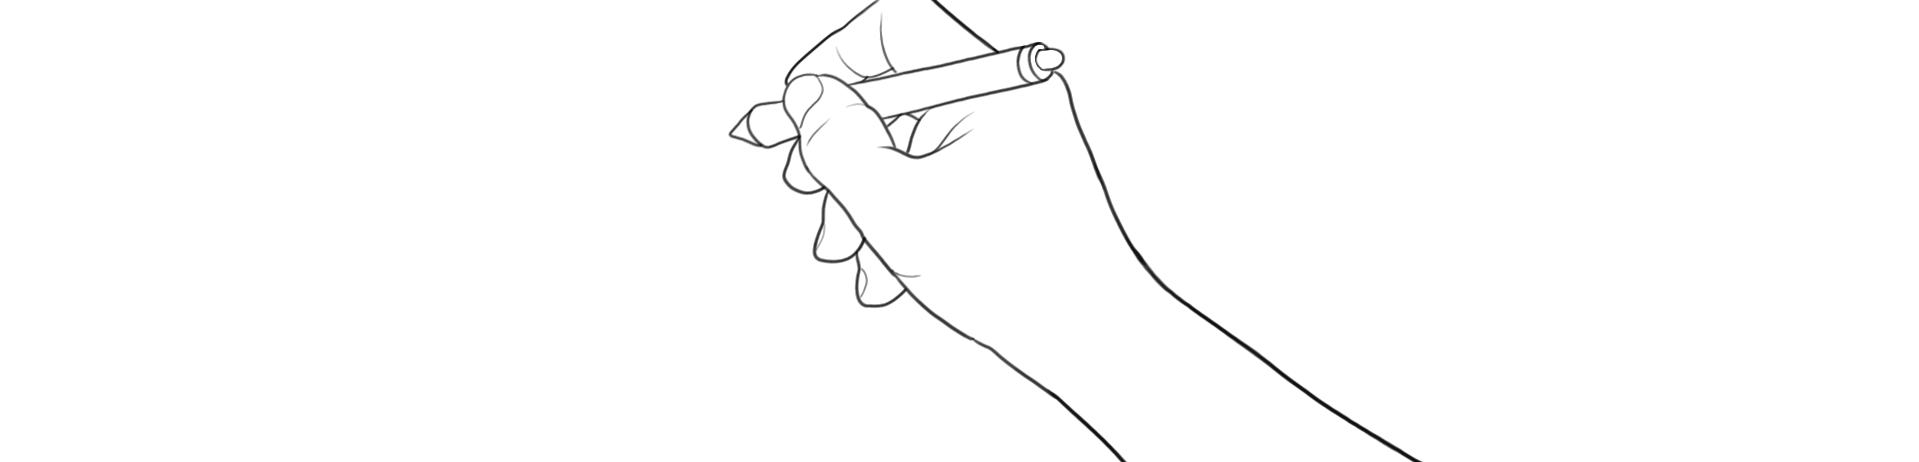 ELEMENTO-4-LINEA-MANO